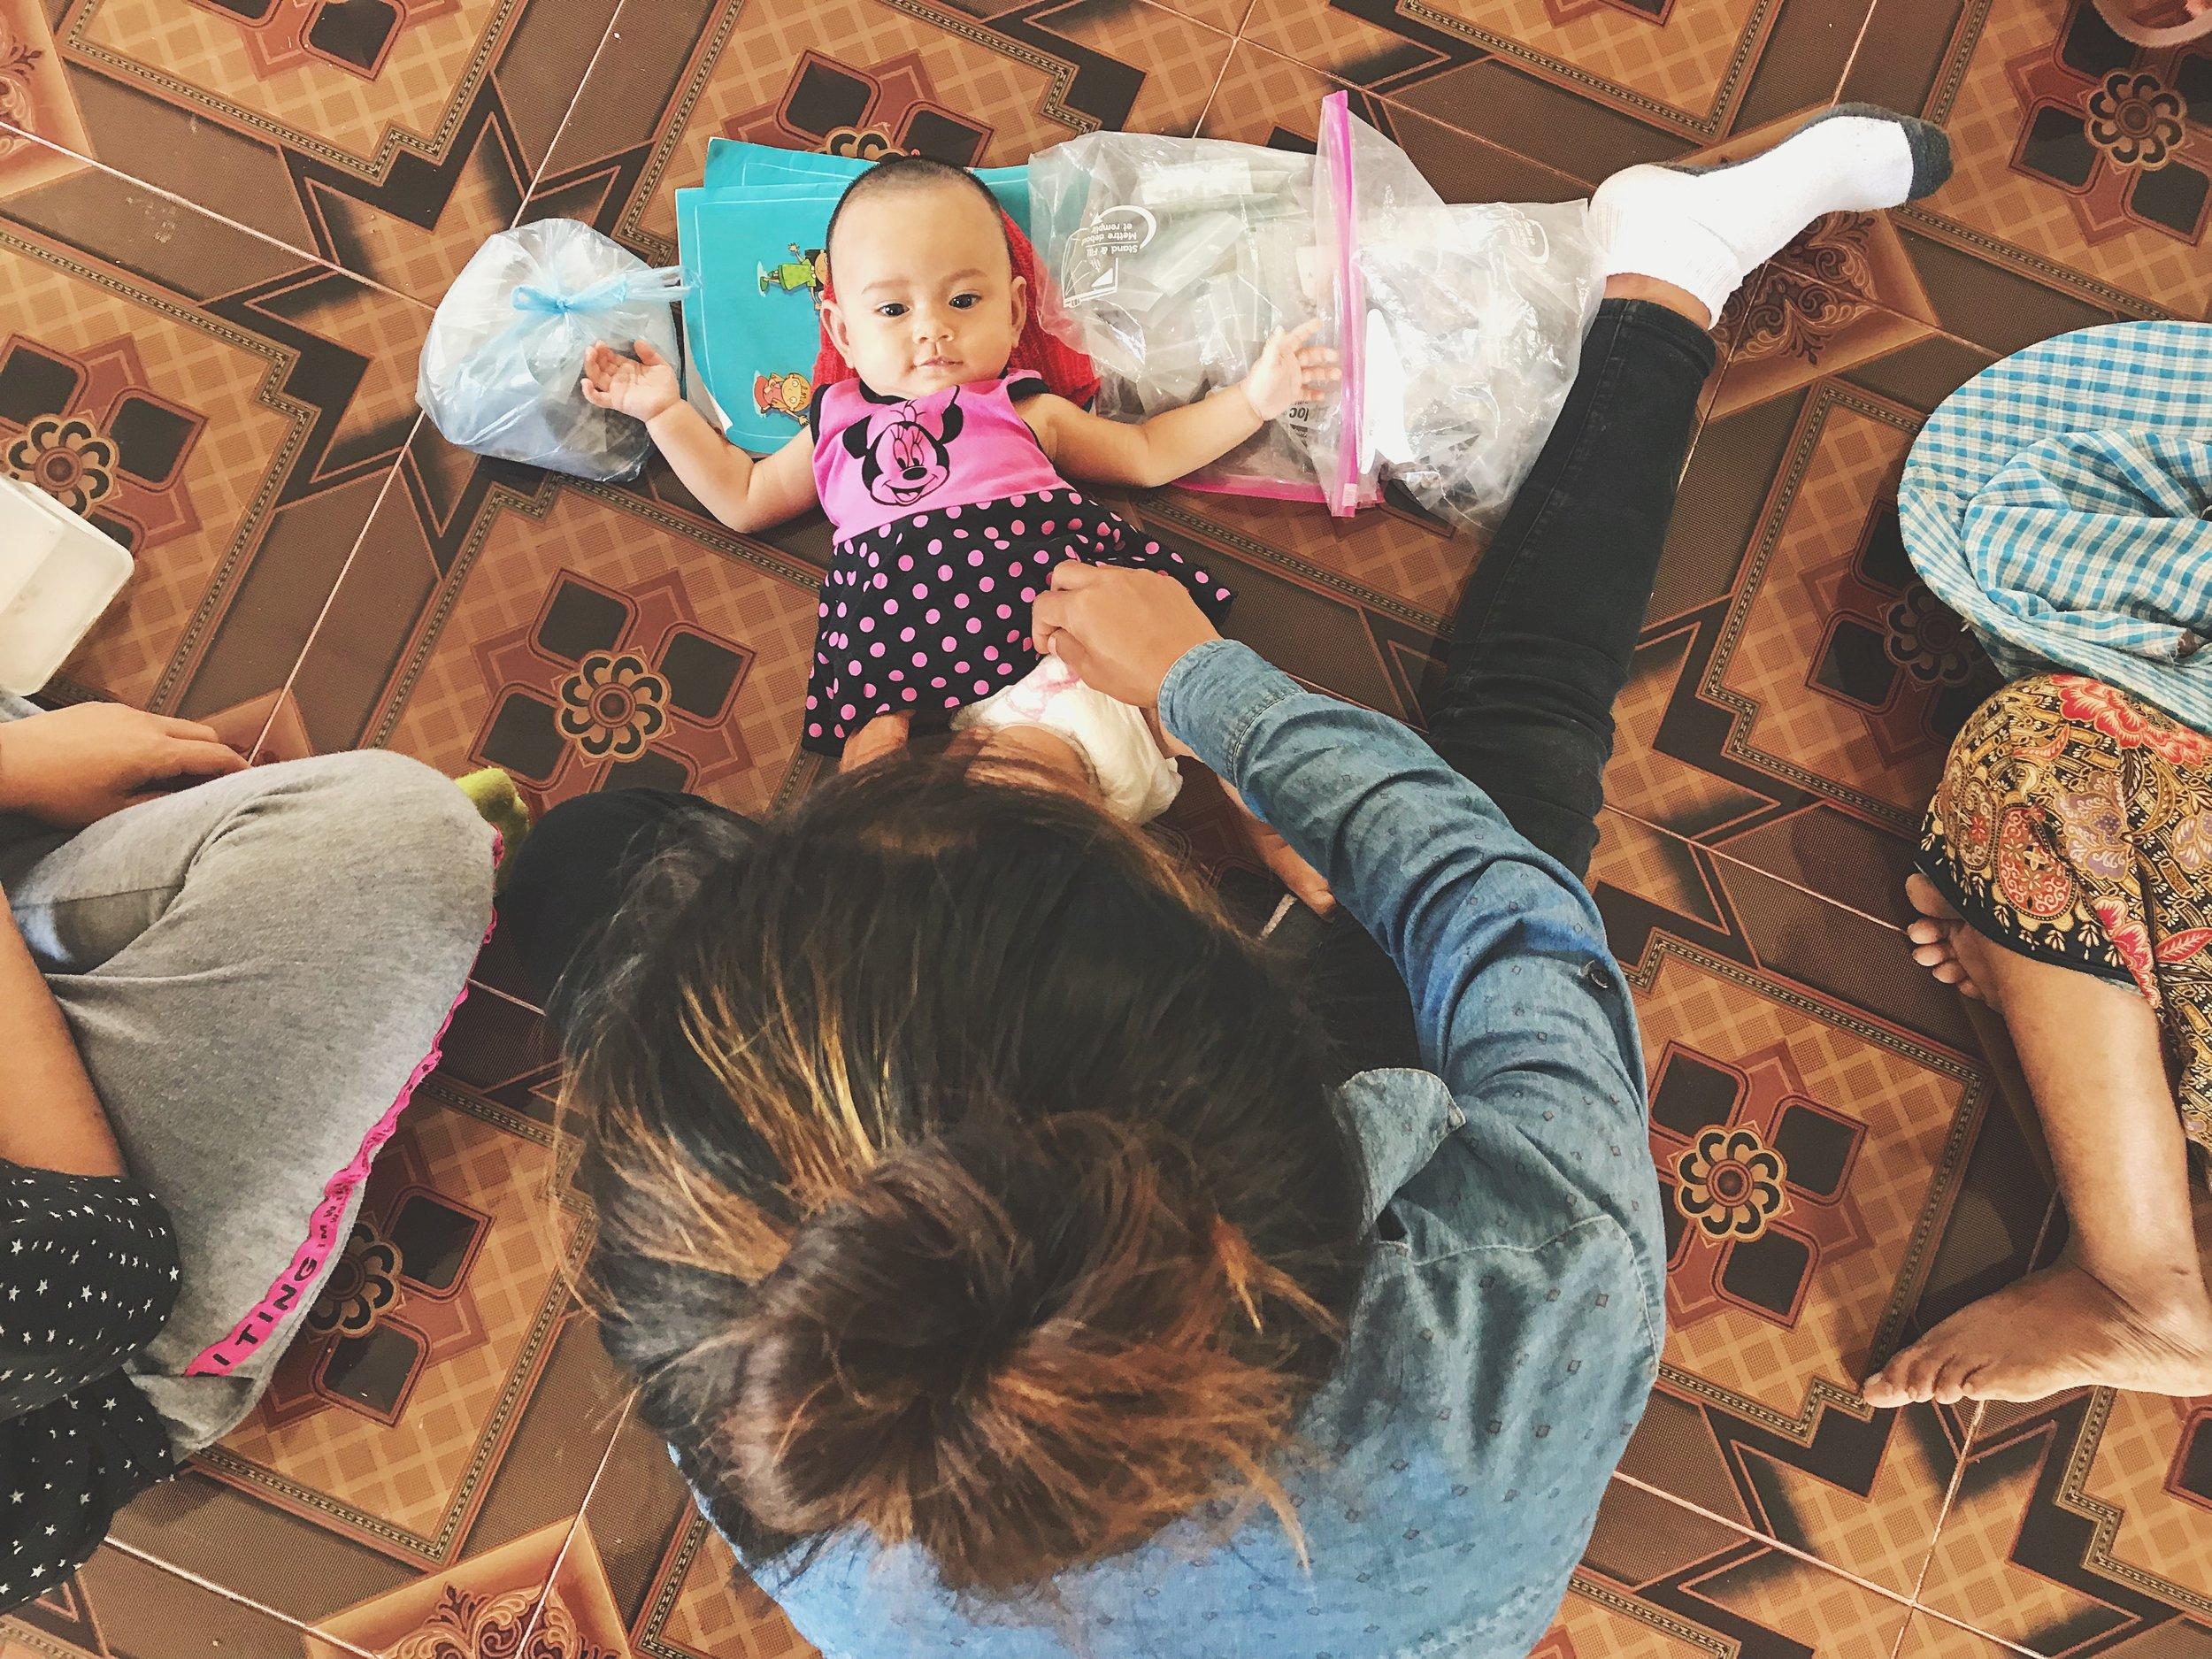 Artisan Srey Mom takes care of her baby born in September 2018.